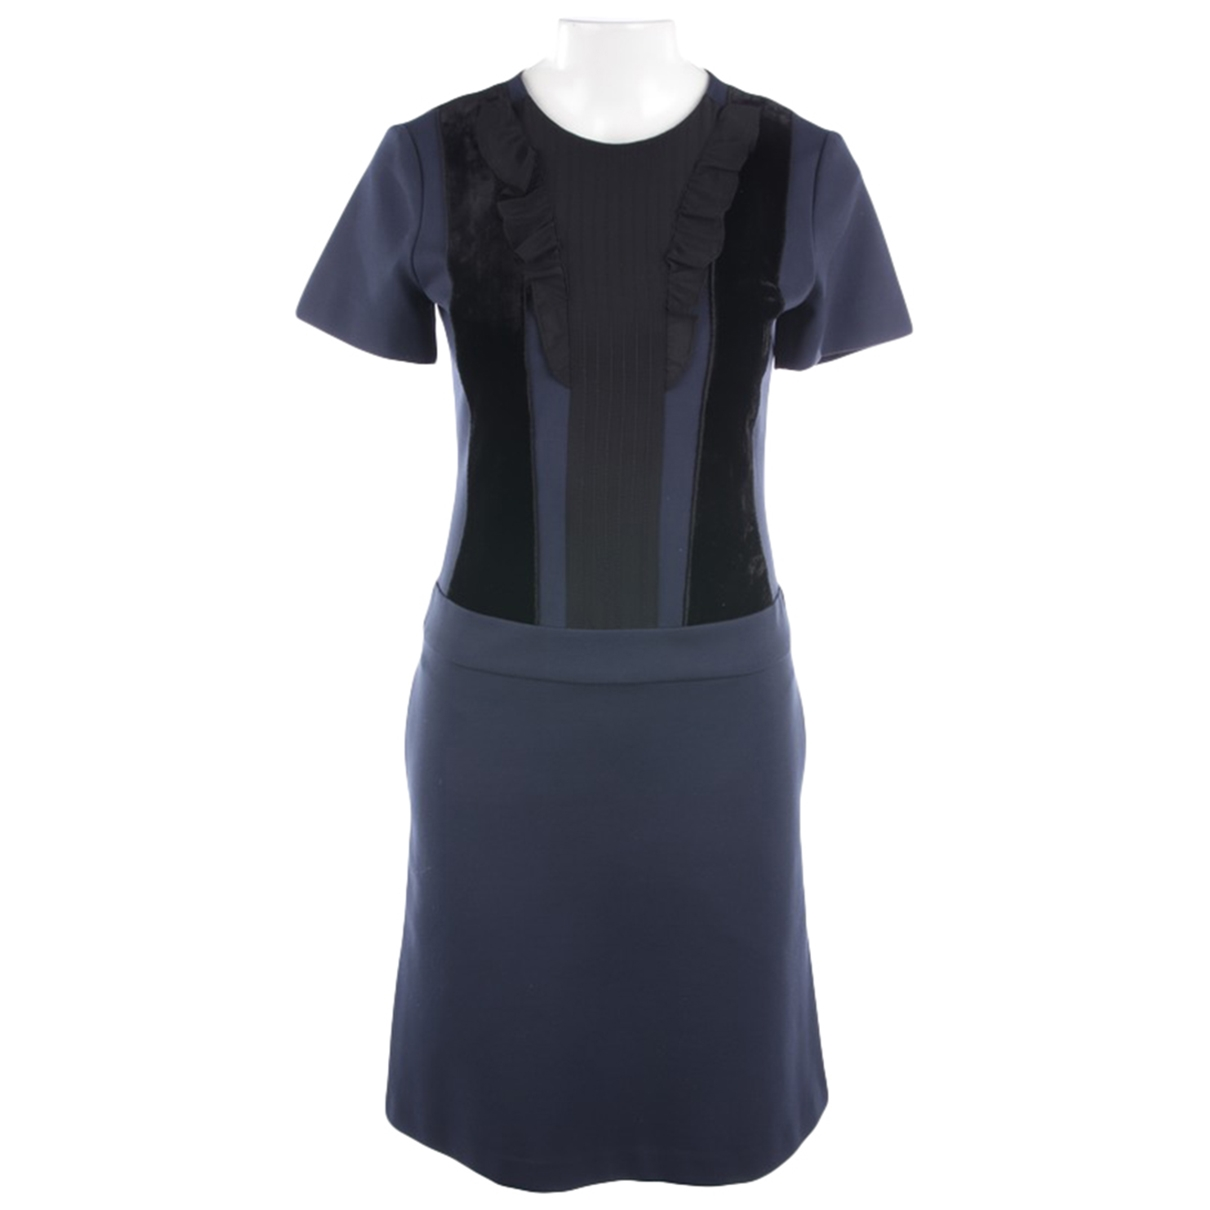 Dorothee Schumacher \N Blue dress for Women 34 FR